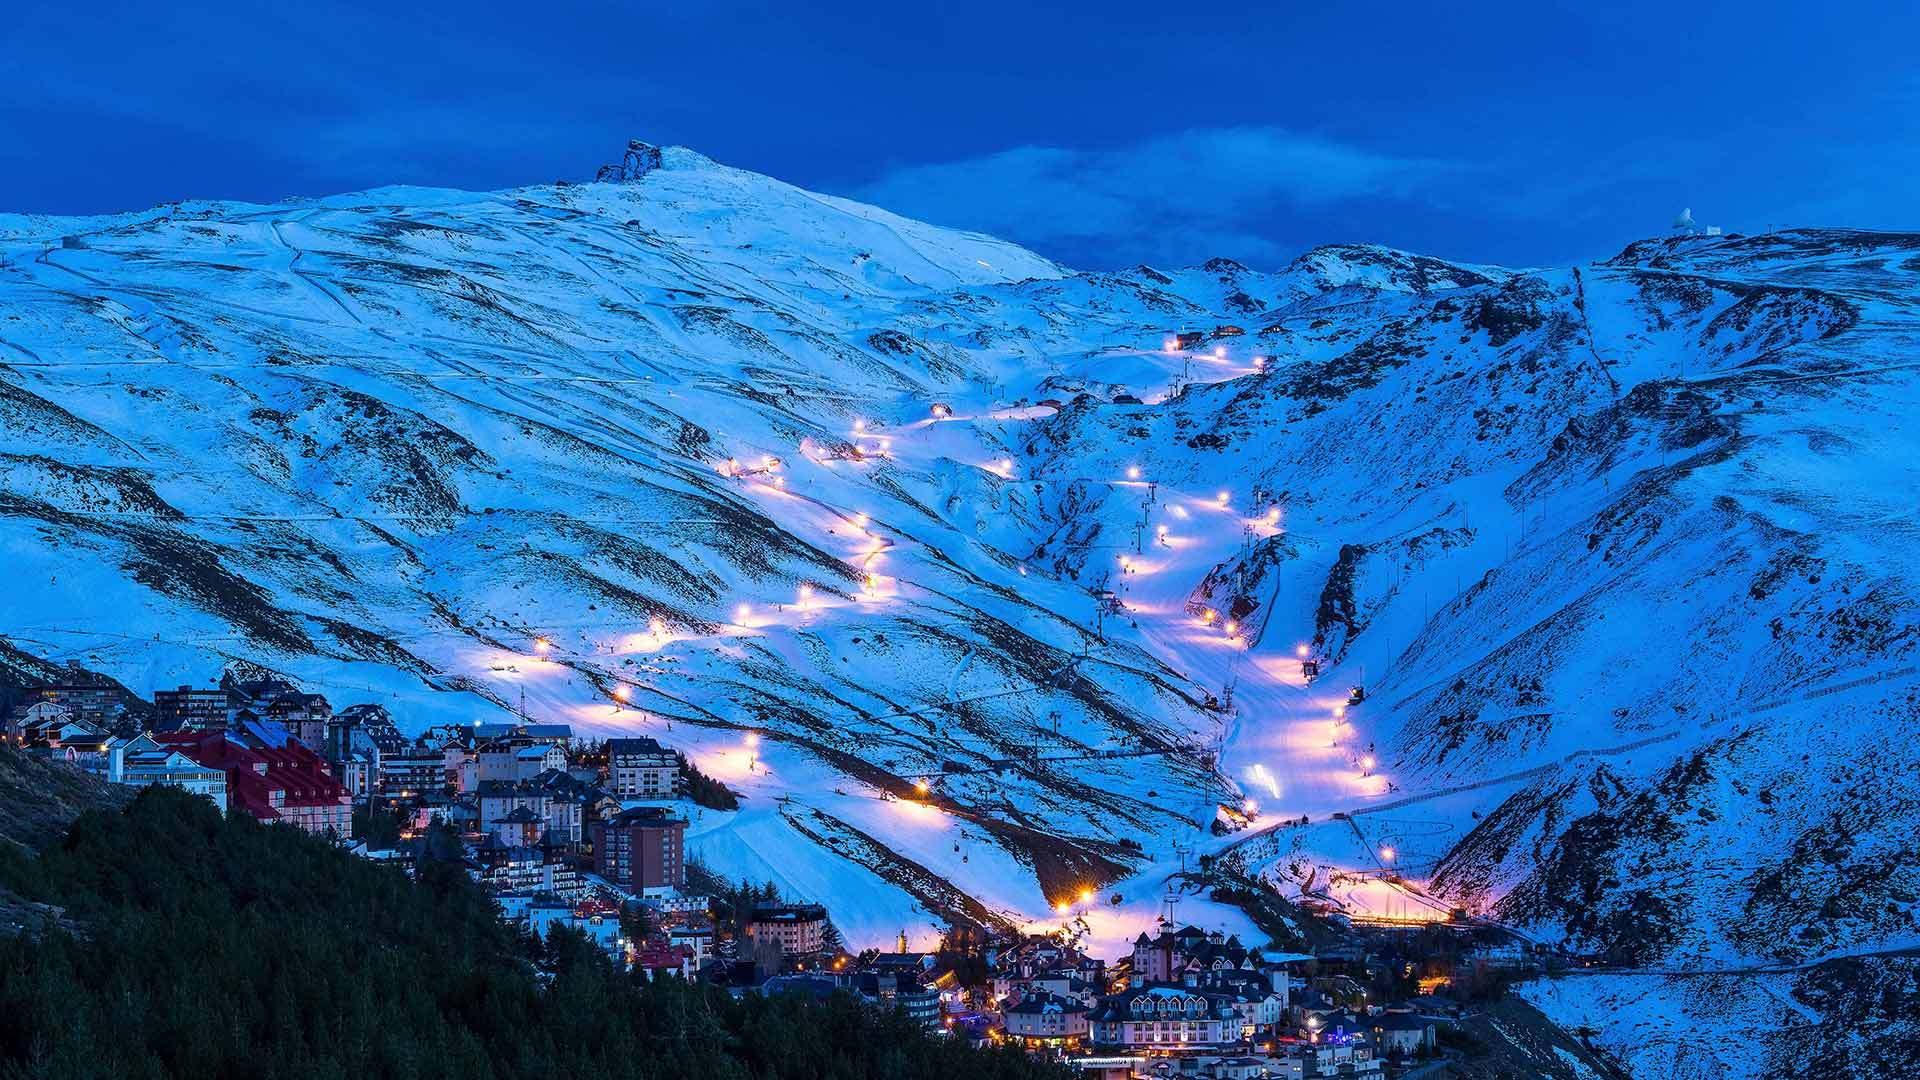 Pradollano滑雪站内华达山脉国家公园